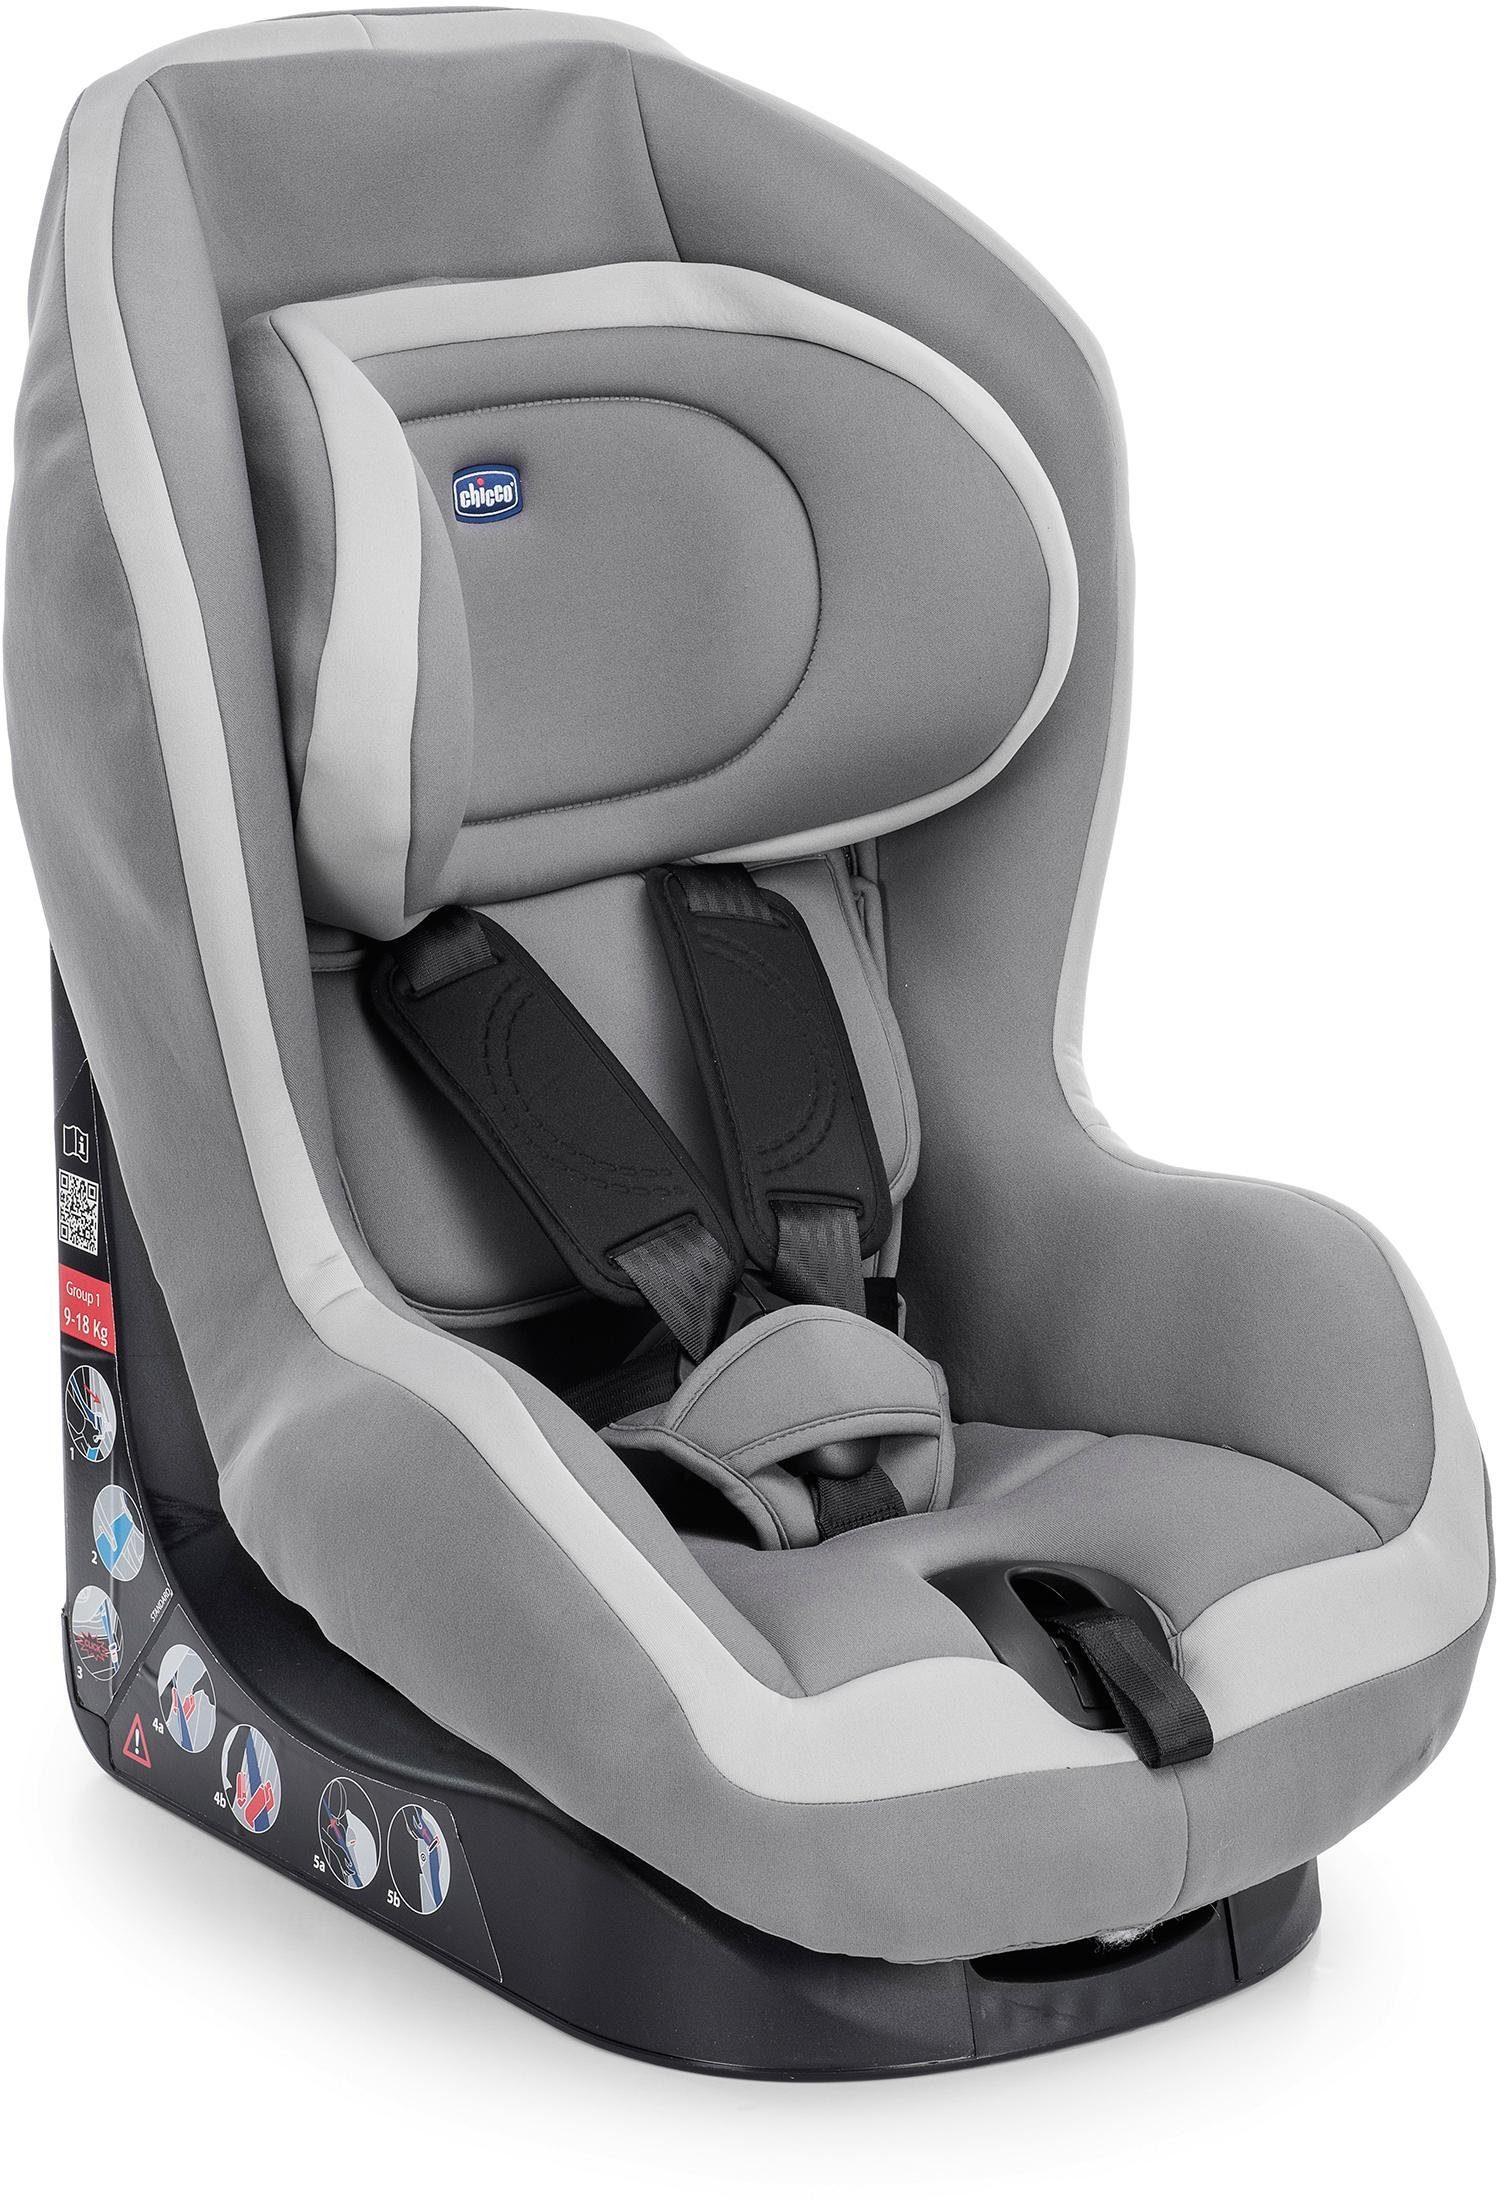 Chicco® Kindersitz, 9 - 18 kg, »Go-One, Moon«